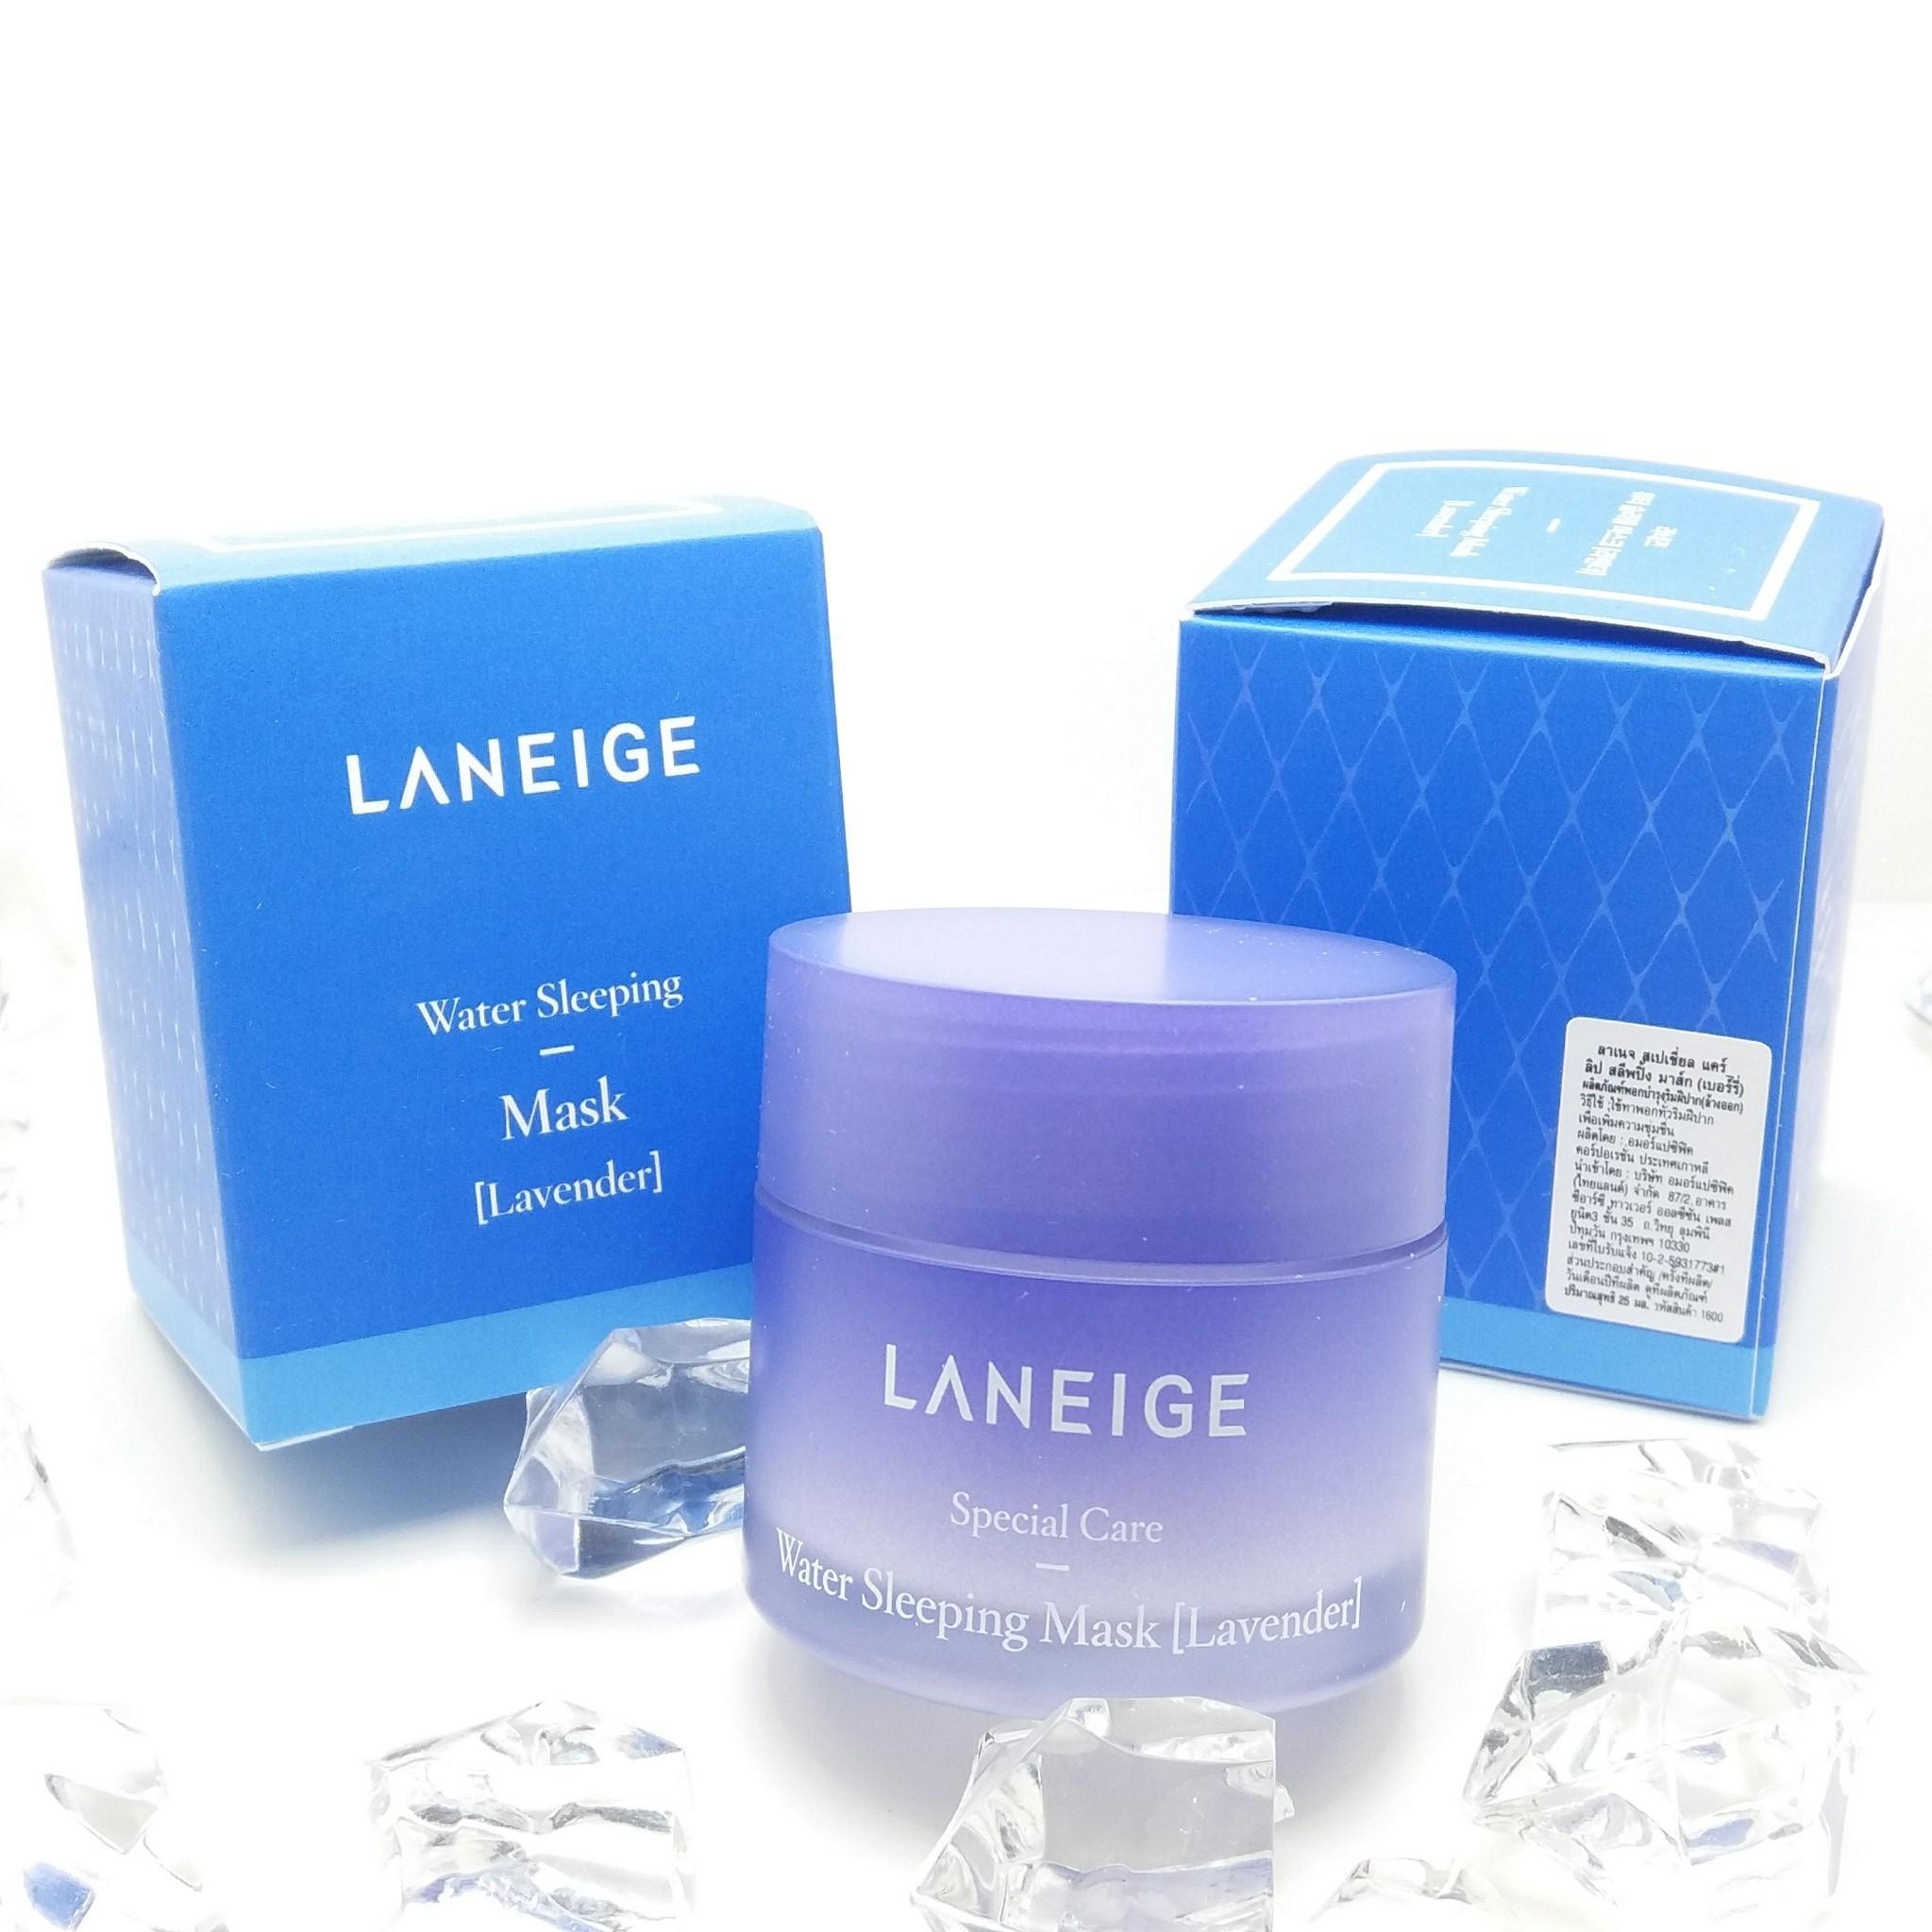 Laneige Water Sleeping Mask Lavender (Limited Edition) 25ml. เจลใสมาส์กหน้ากลิ่นลาเวนเดอร์ สำหรับทุกสภาพผิว แบบไม่ต้องล้างออก เนื้อเจลเย็นๆ บางเบาซึมซาบเร็ว พร้อมกลิ่นหอมที่ถูกคิดค้นเป็นพิเศษ มอบความรู้สึกผ่อนคลายสบายผิว เข้าเติมน้ำให้ผิวขณะหลับอย่างล้ำลึ